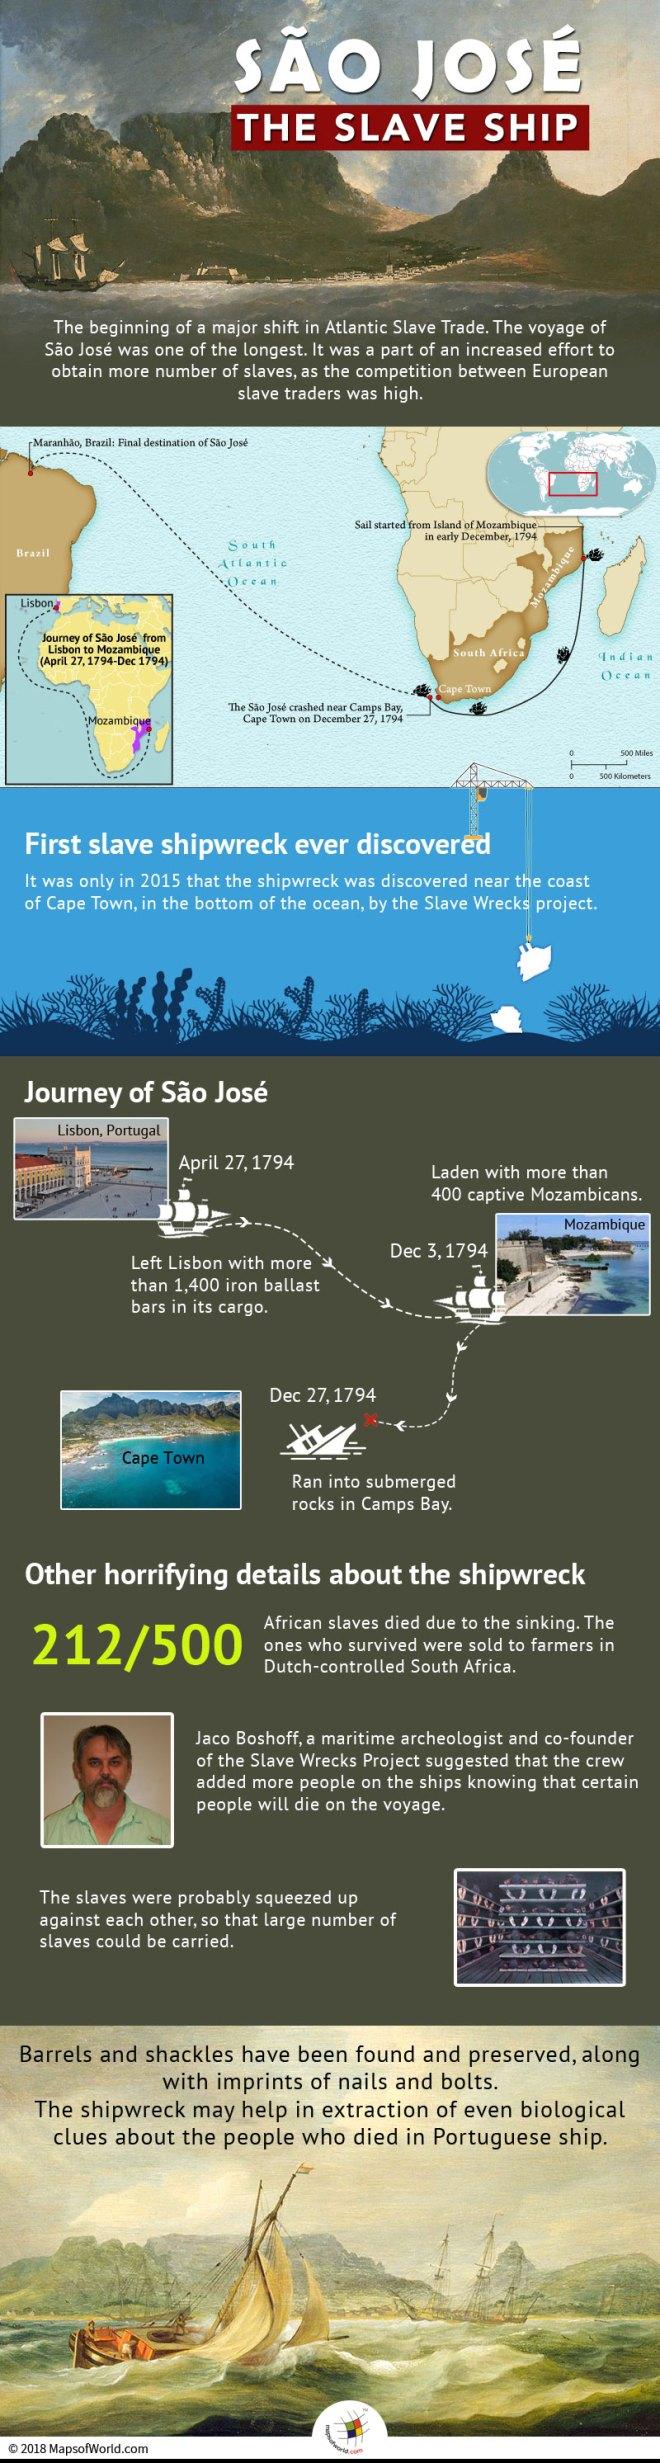 The Voyage of The Slave Ship - São José was The Longest